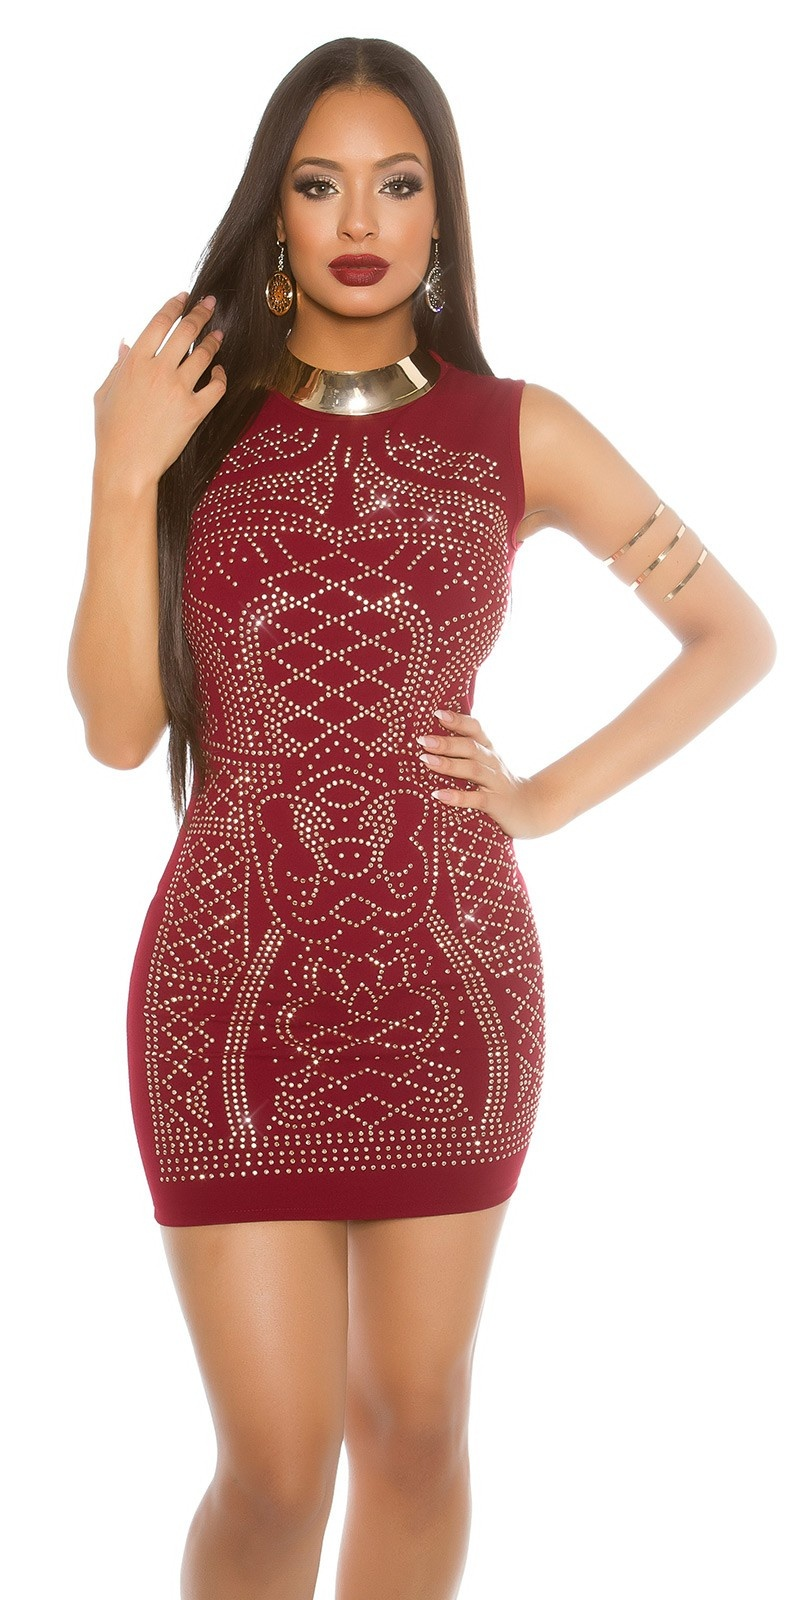 Party mini-jurk met studs patroon Bordeaux